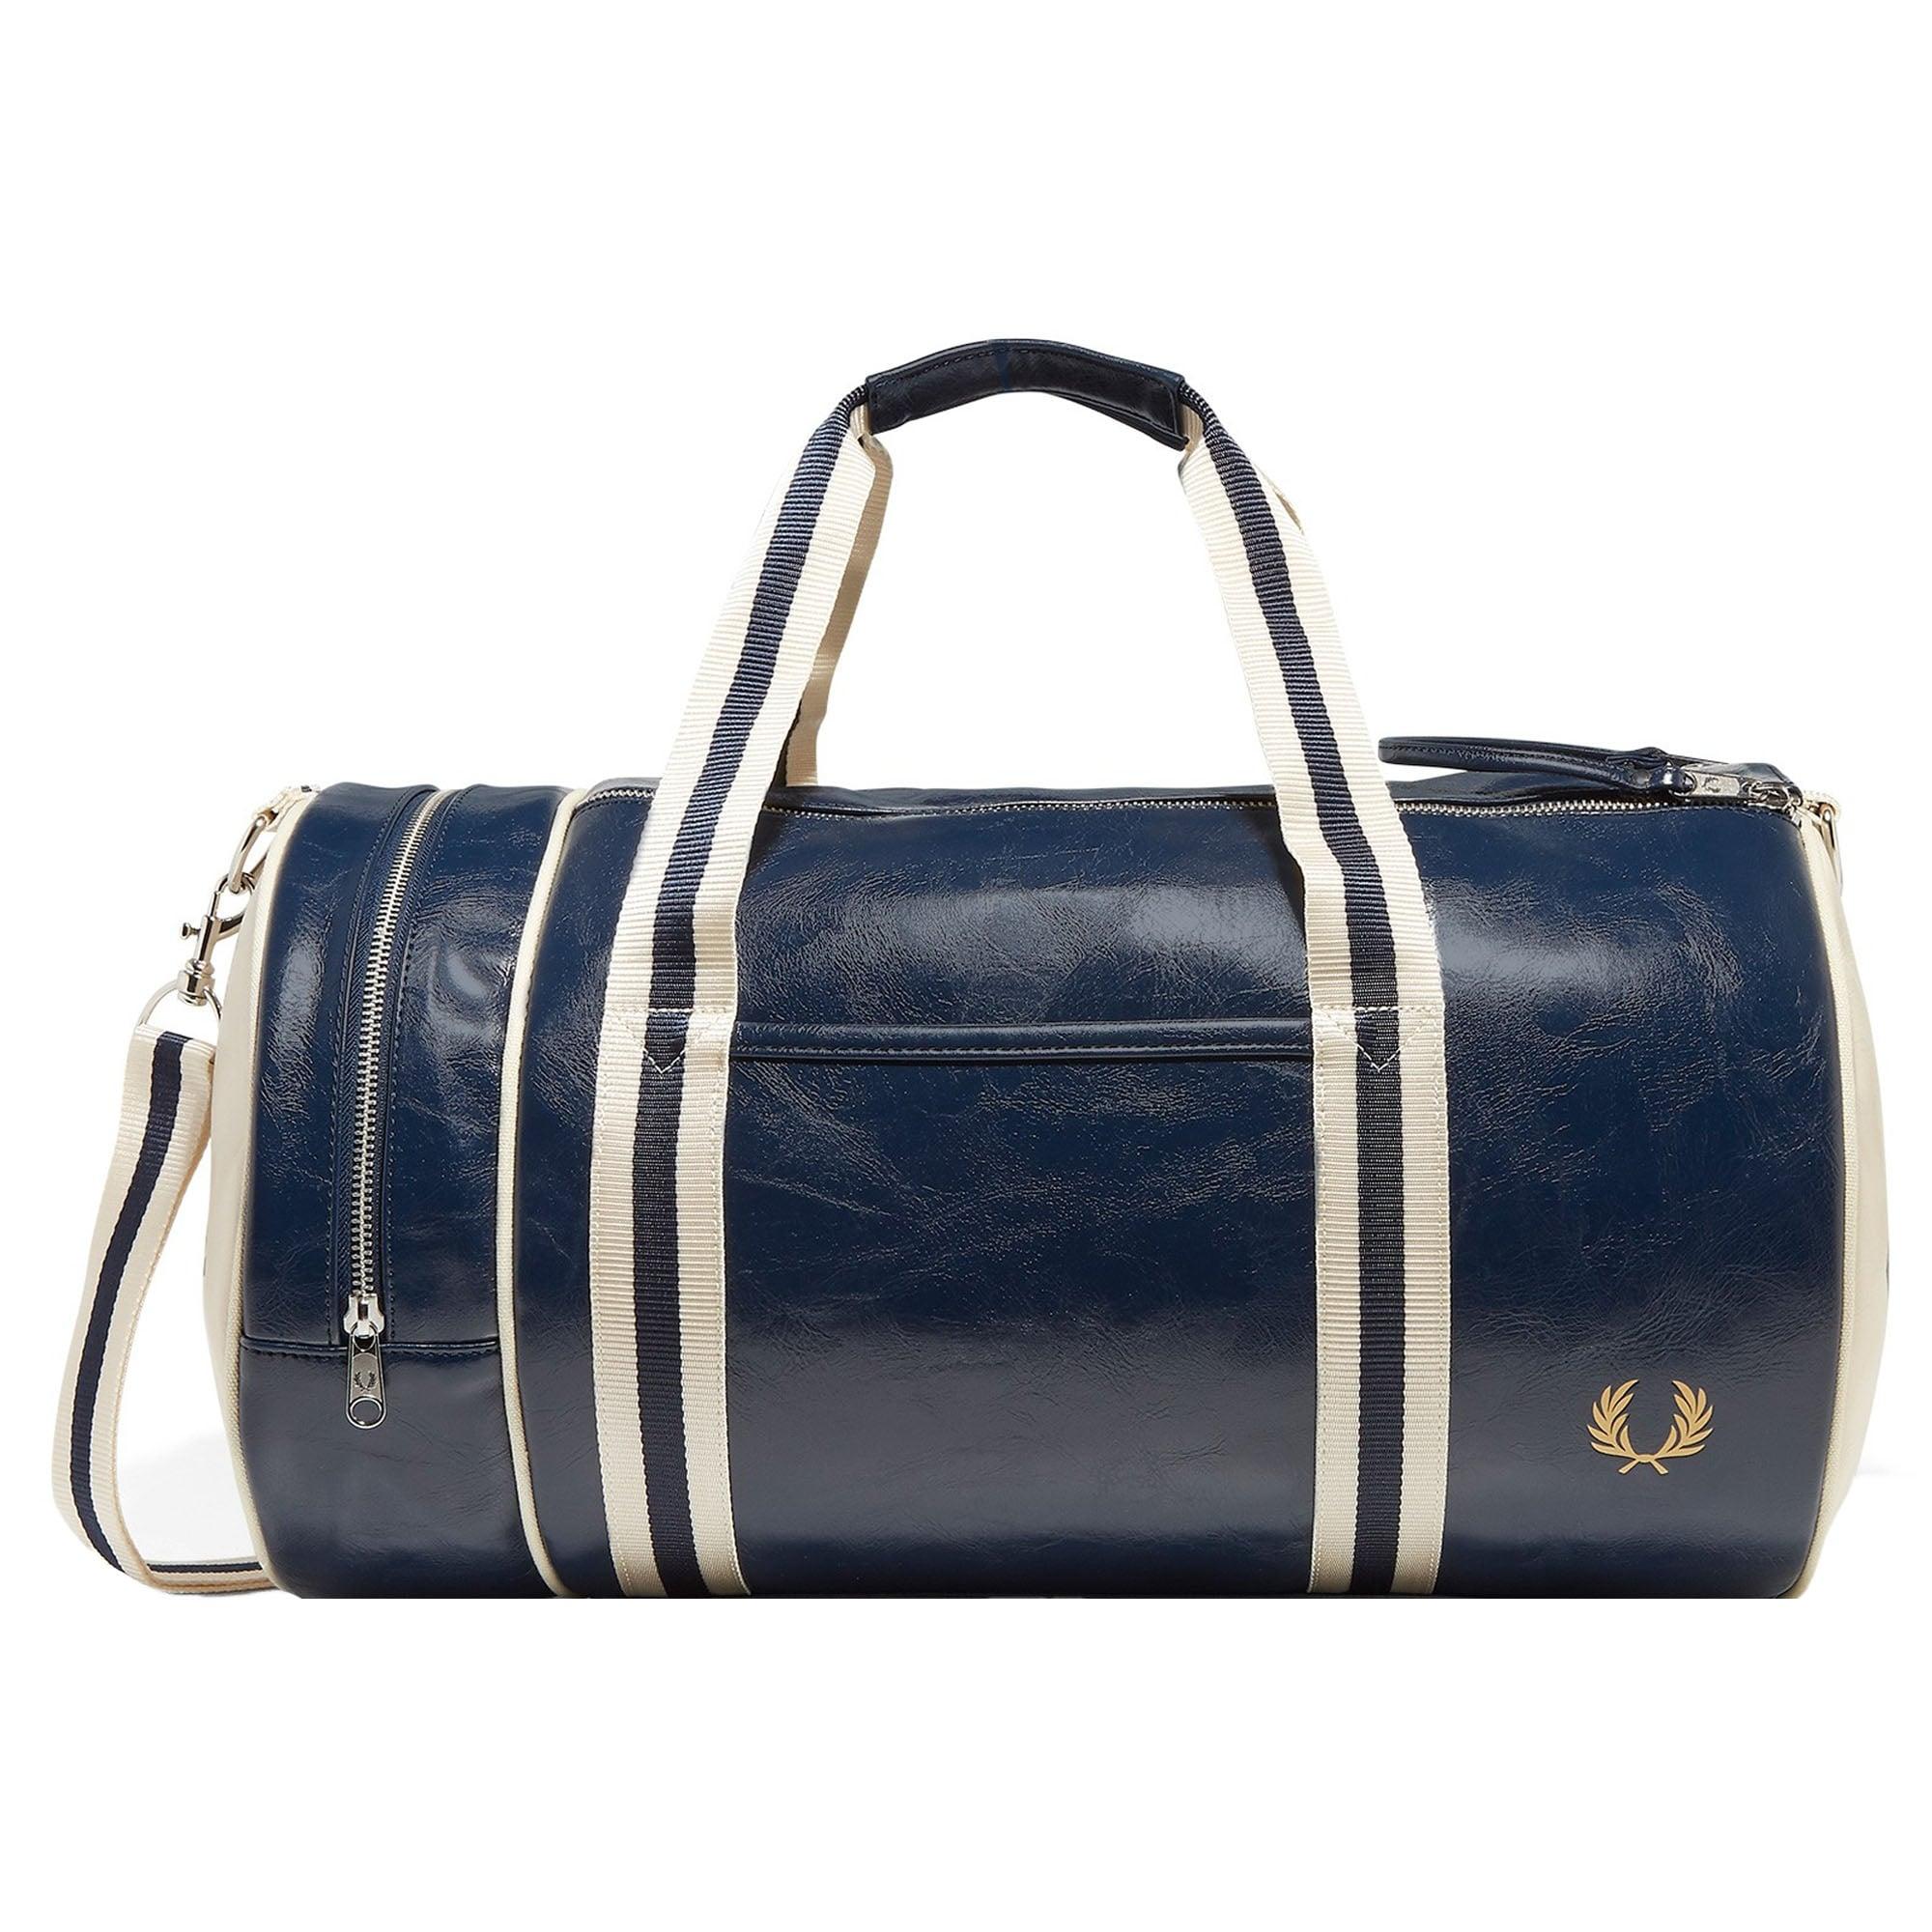 0e57458fdcac Fred Perry Navy Classic Barrel Bag L3330